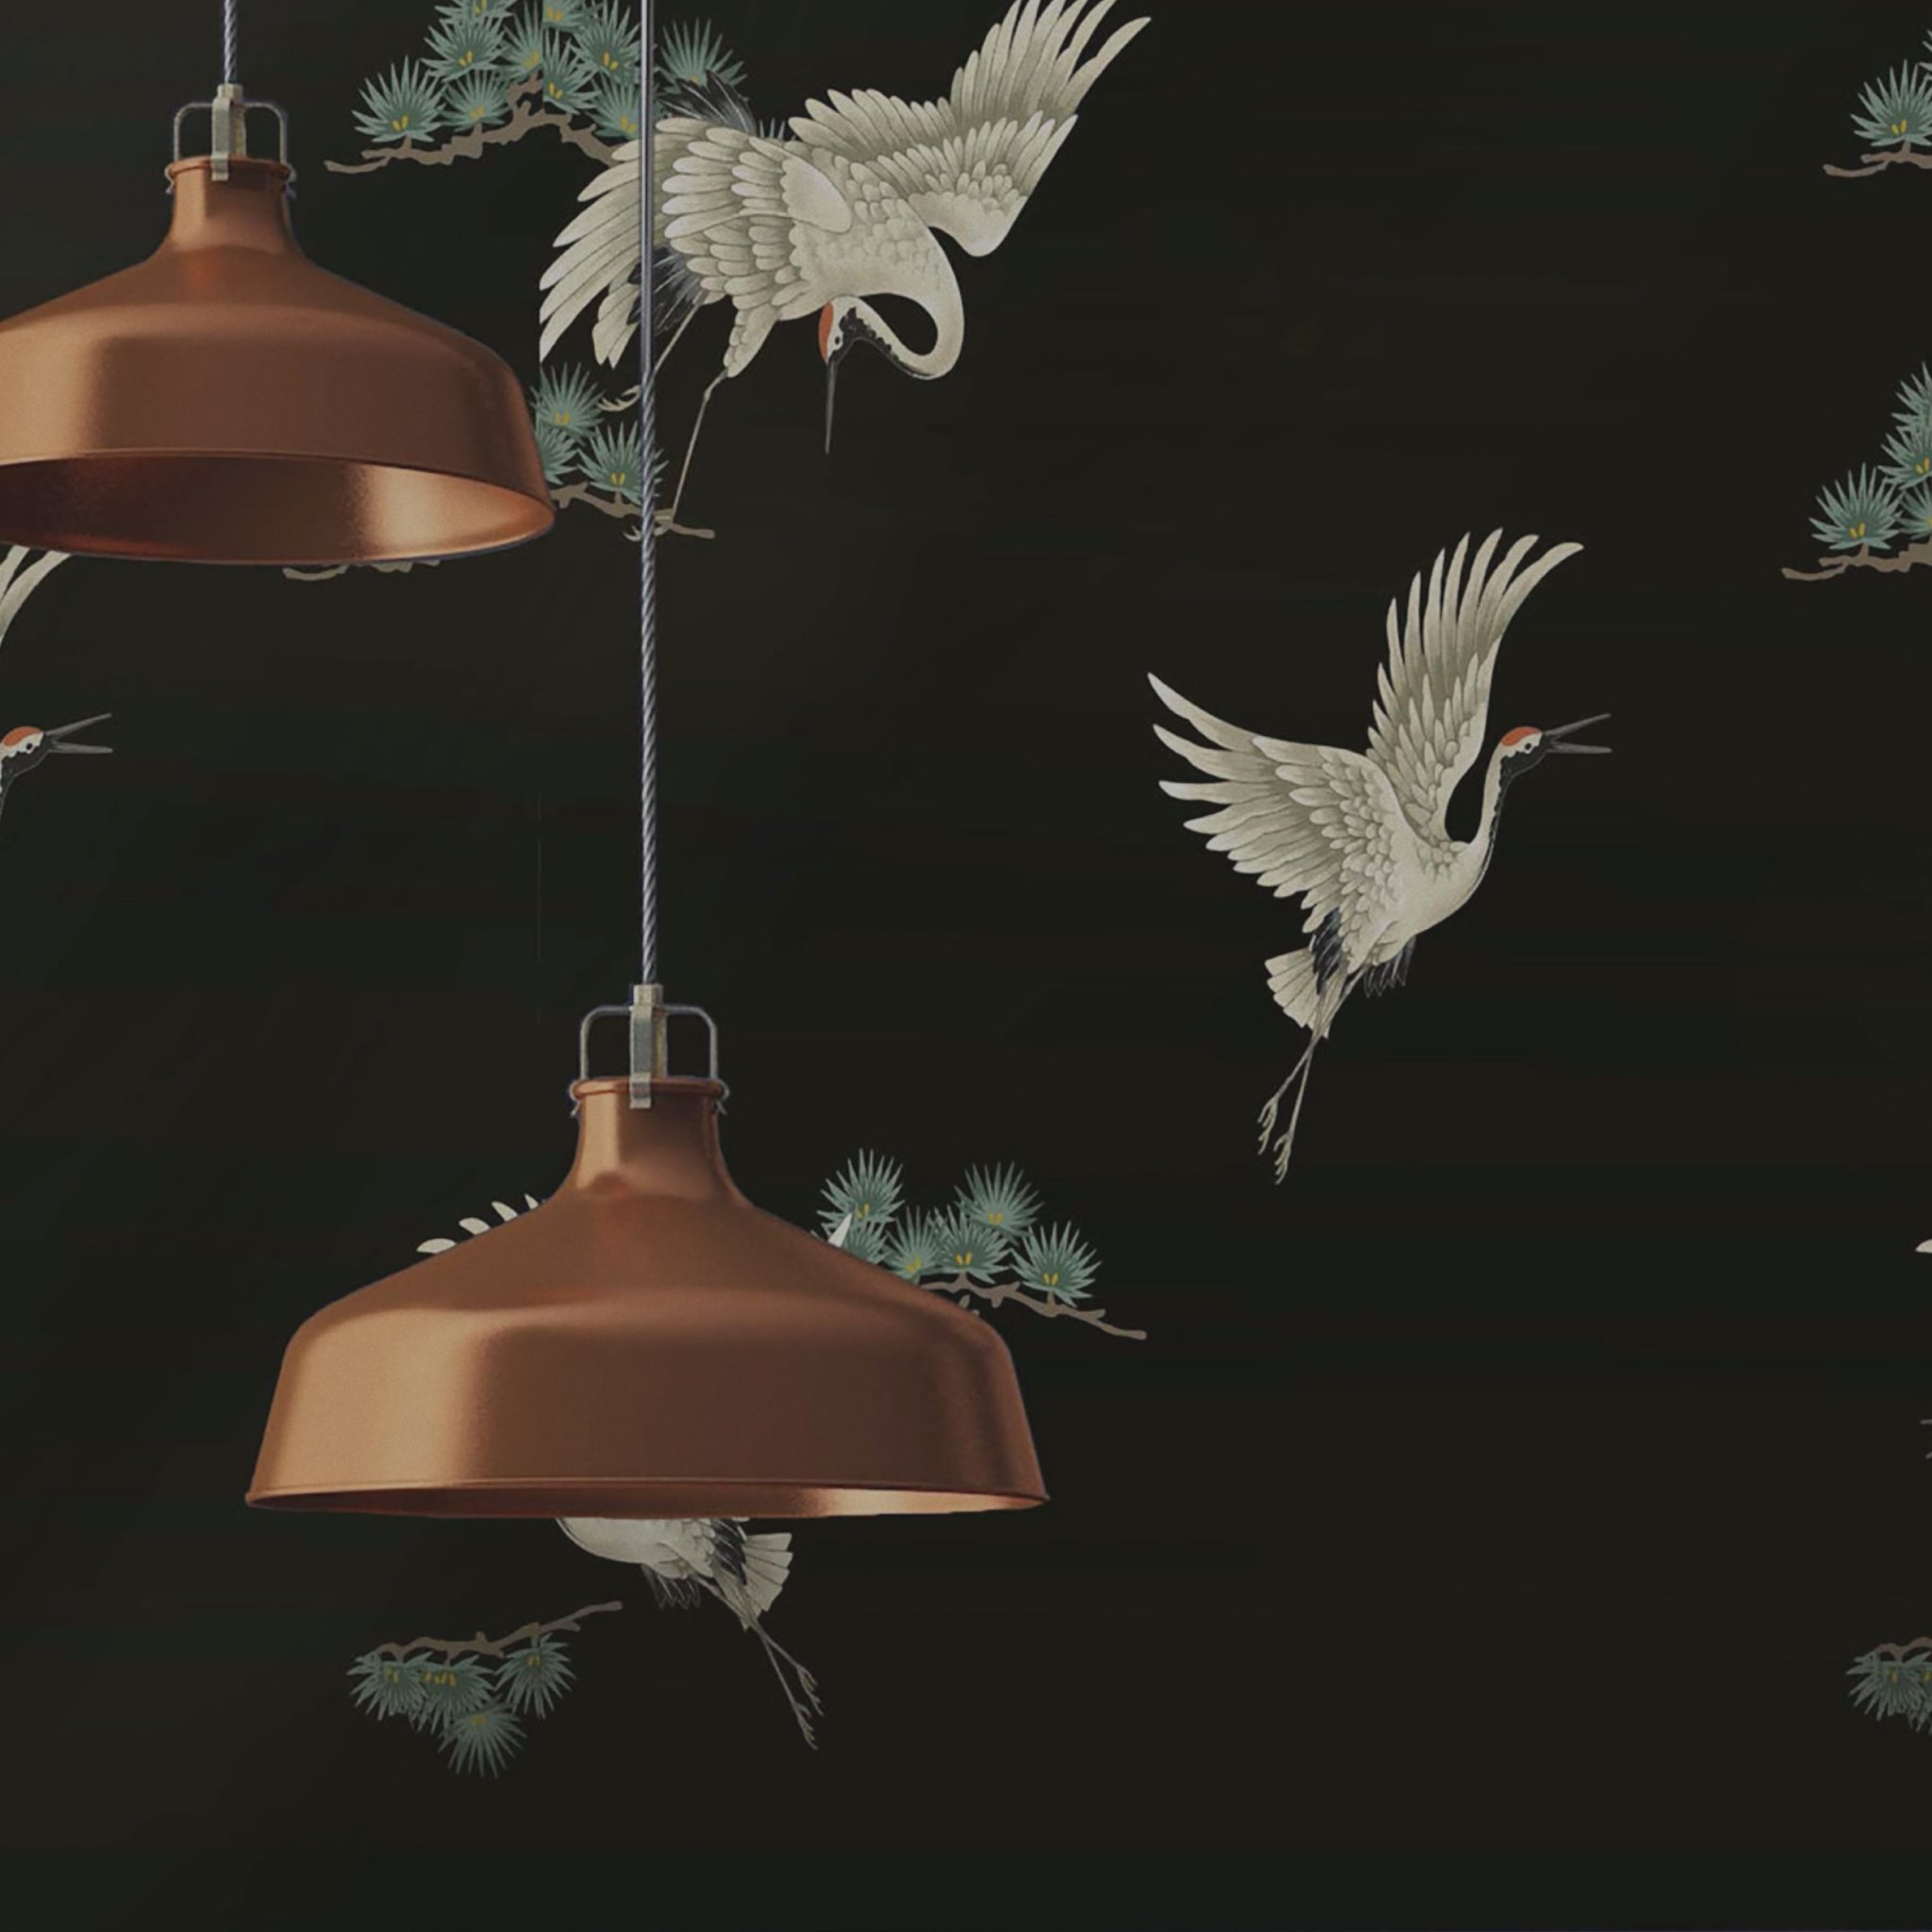 best hd Heron Wallpaper